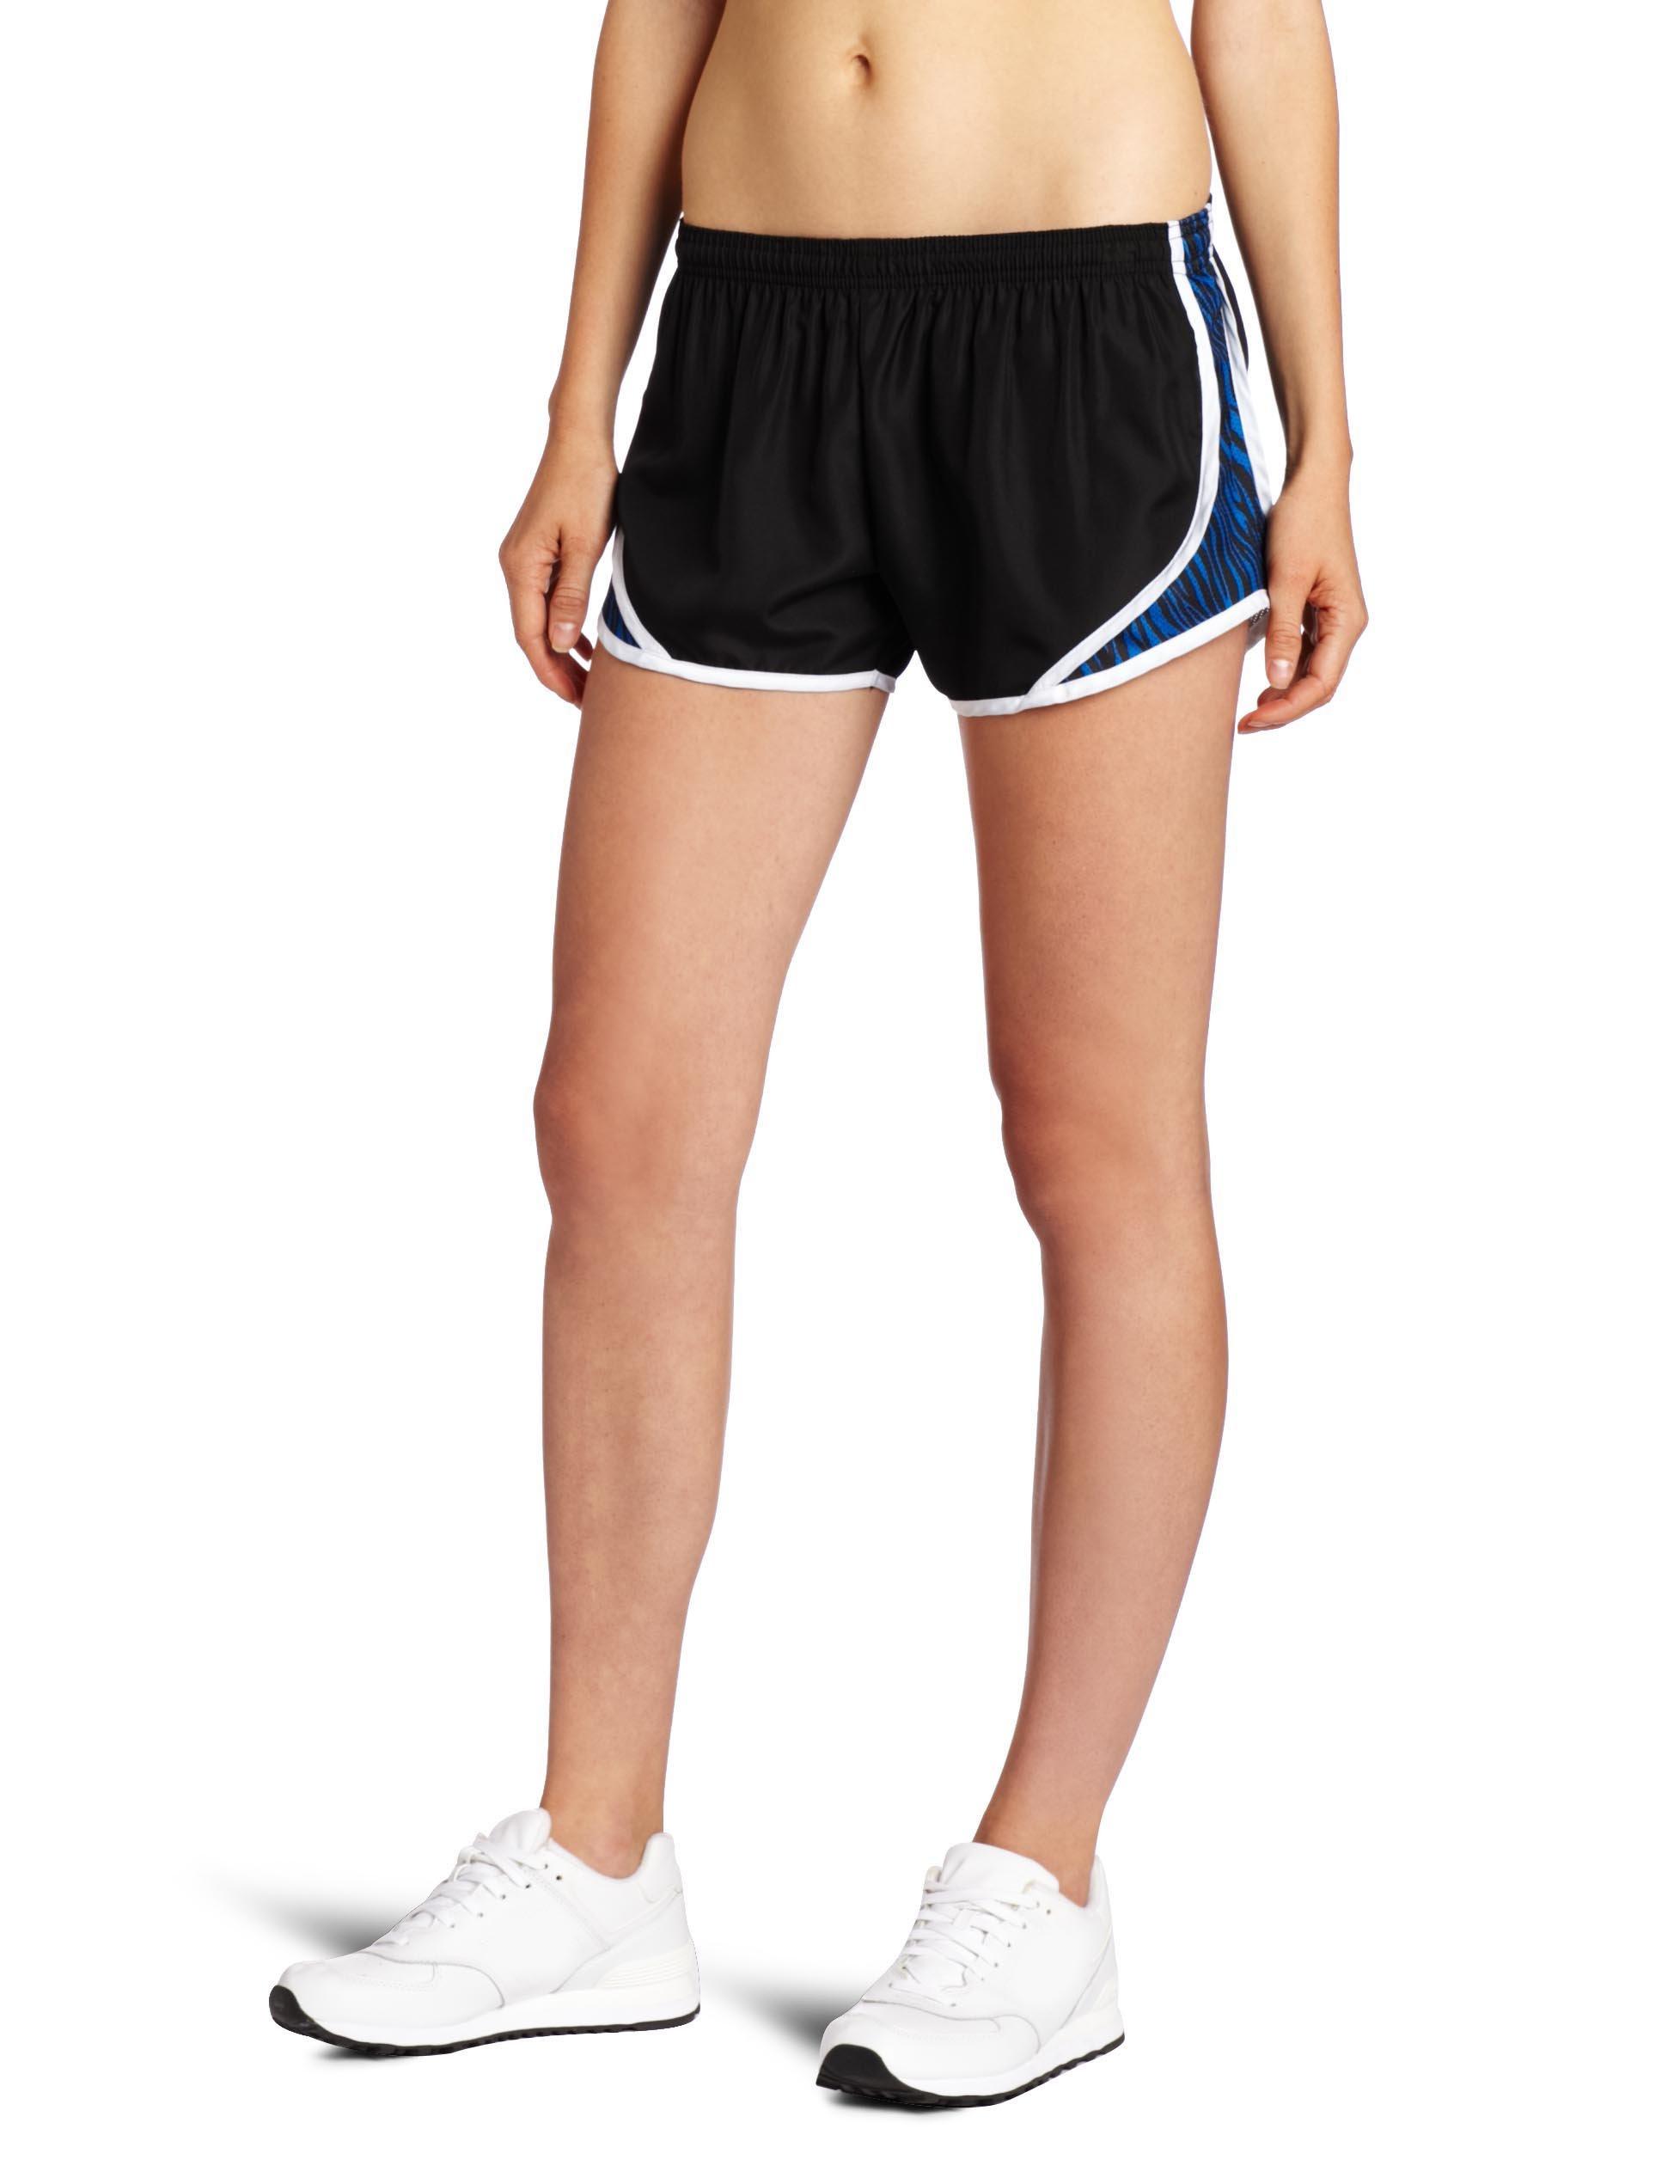 Soffe MJ Teen-girlswomen's Juniors' Team Shorty Shorts, Black/Electric Blue Zebra, Medium by Soffe